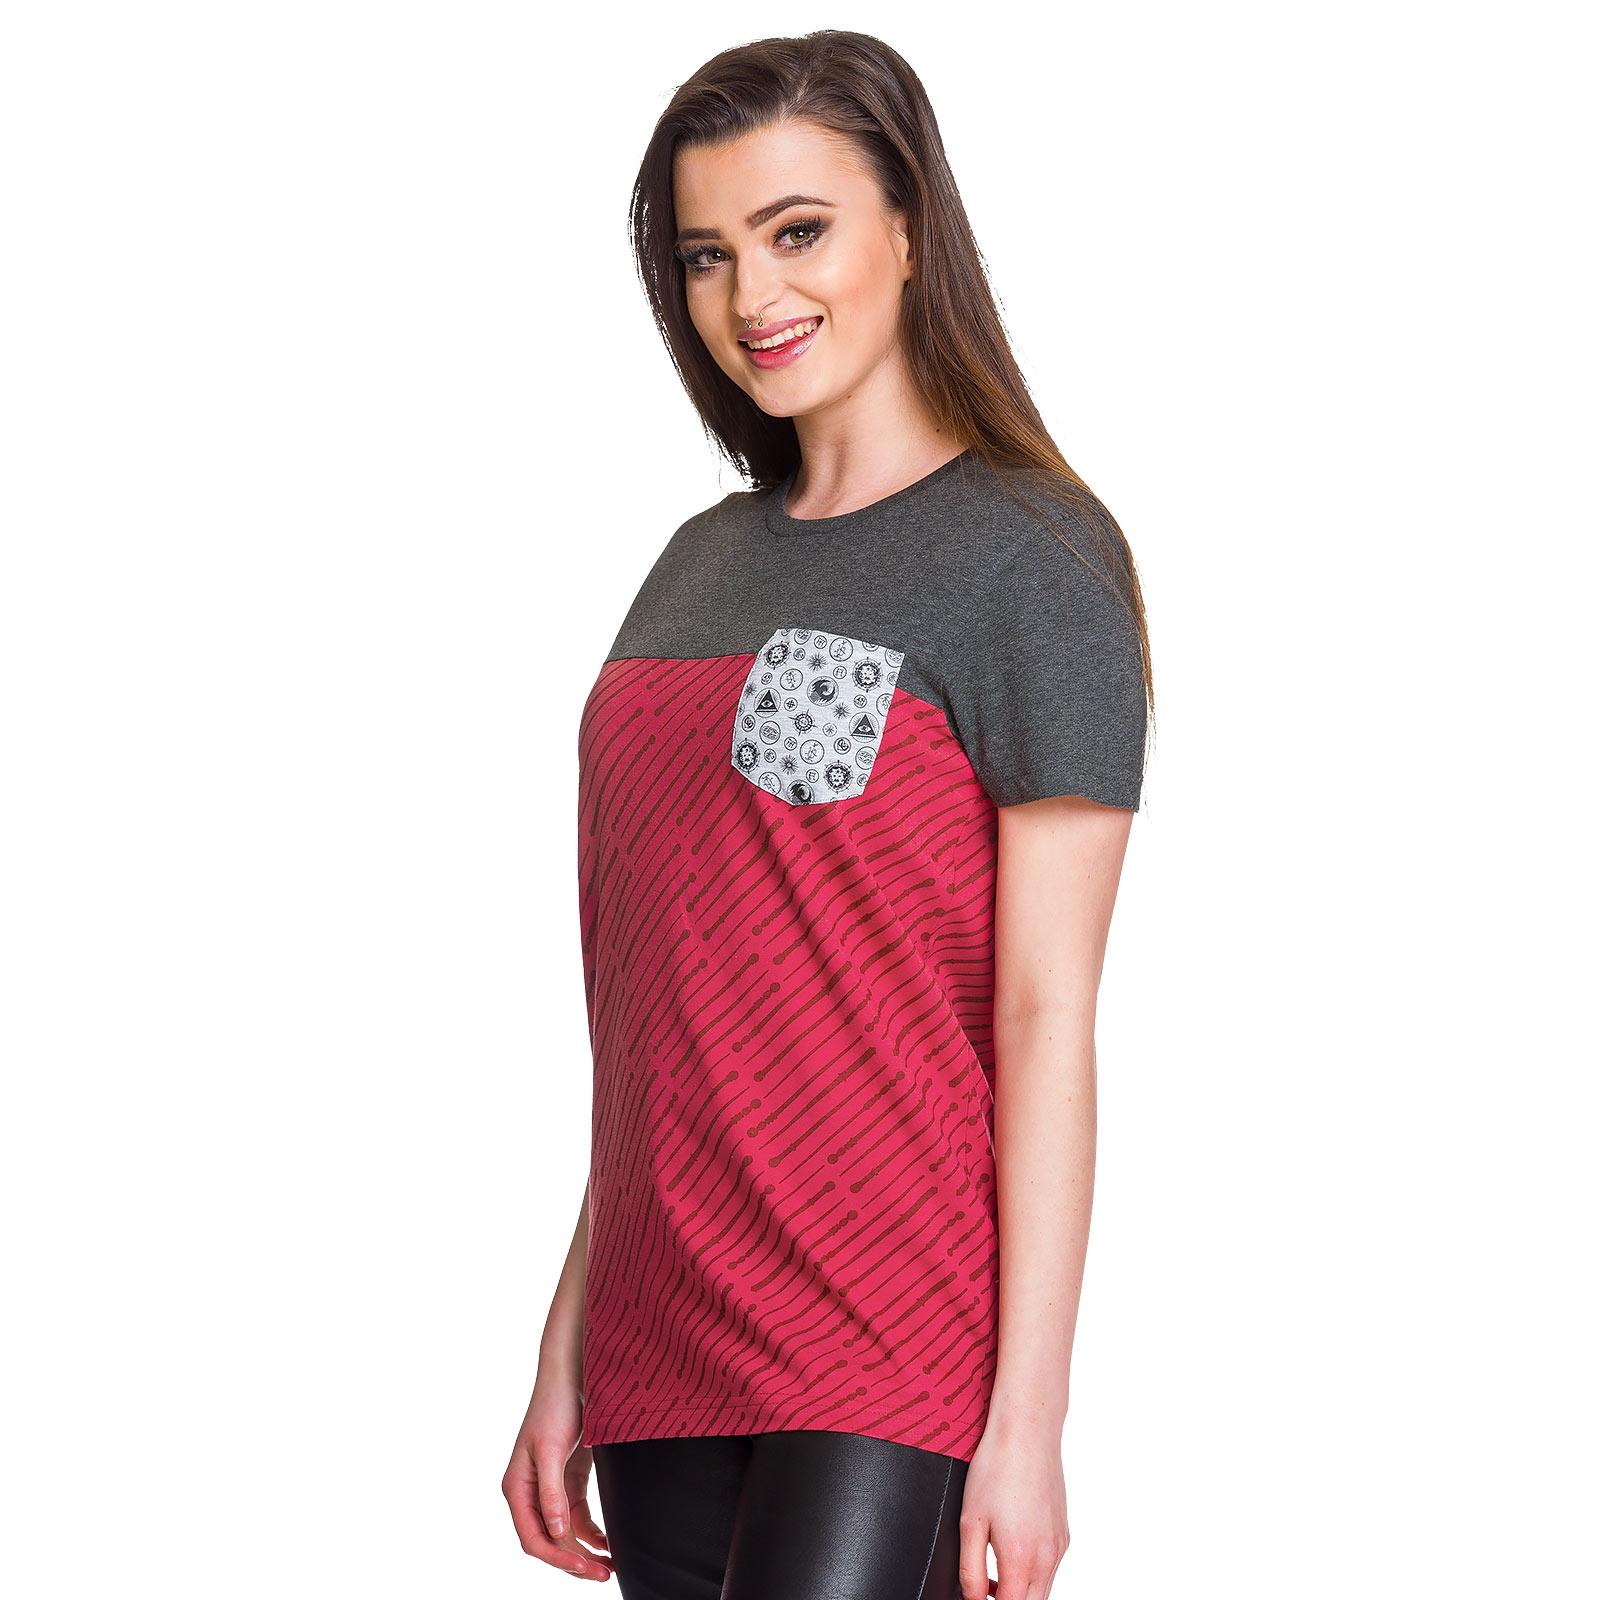 Phantastische Tierwesen - Magic Symbols T-Shirt